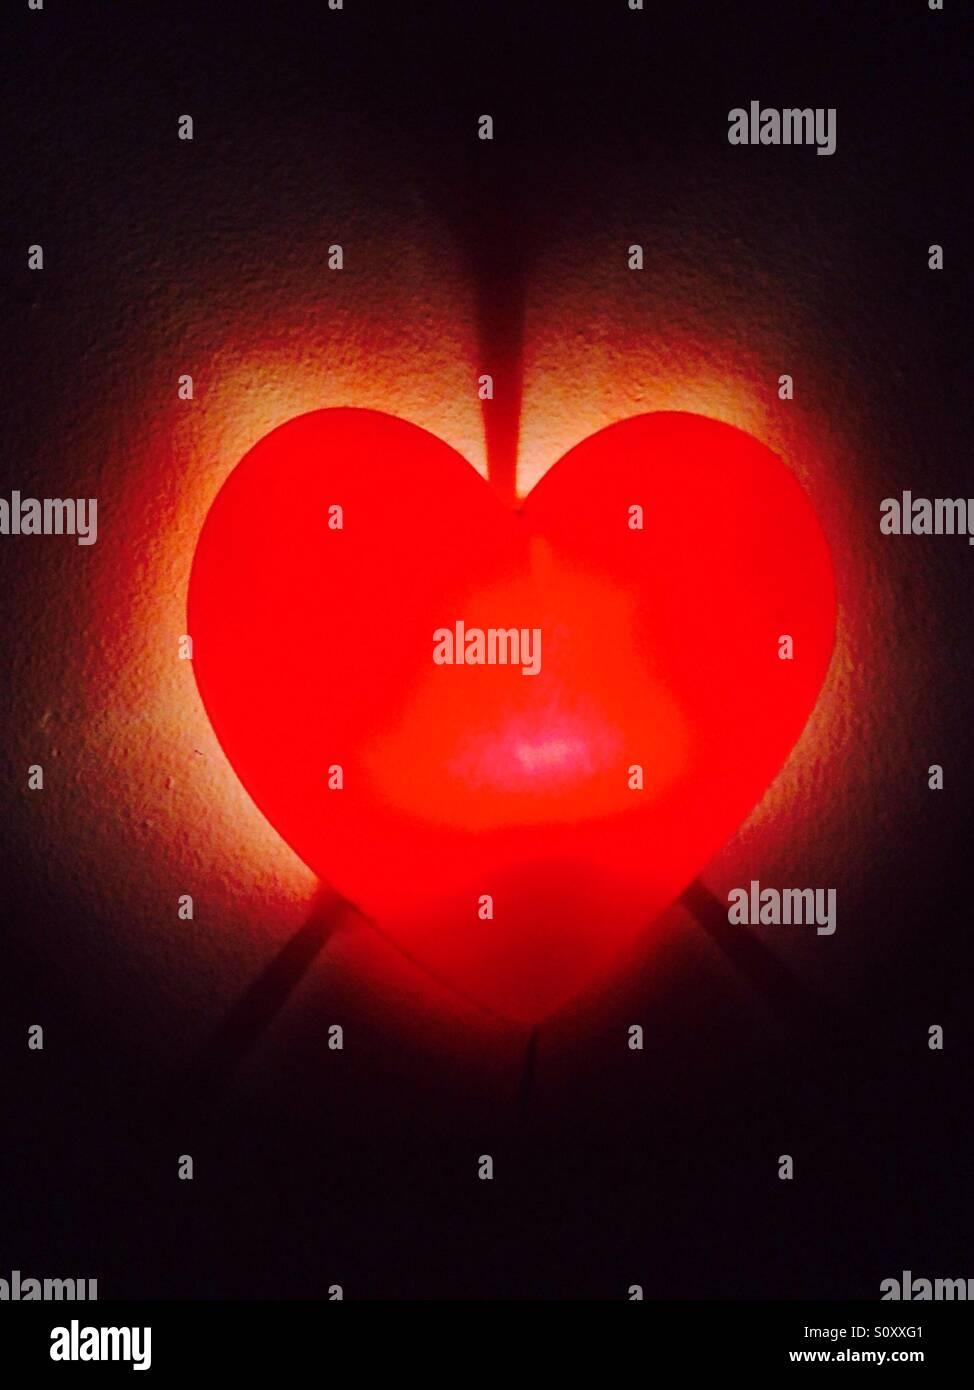 Red heart illuminated - Stock Image